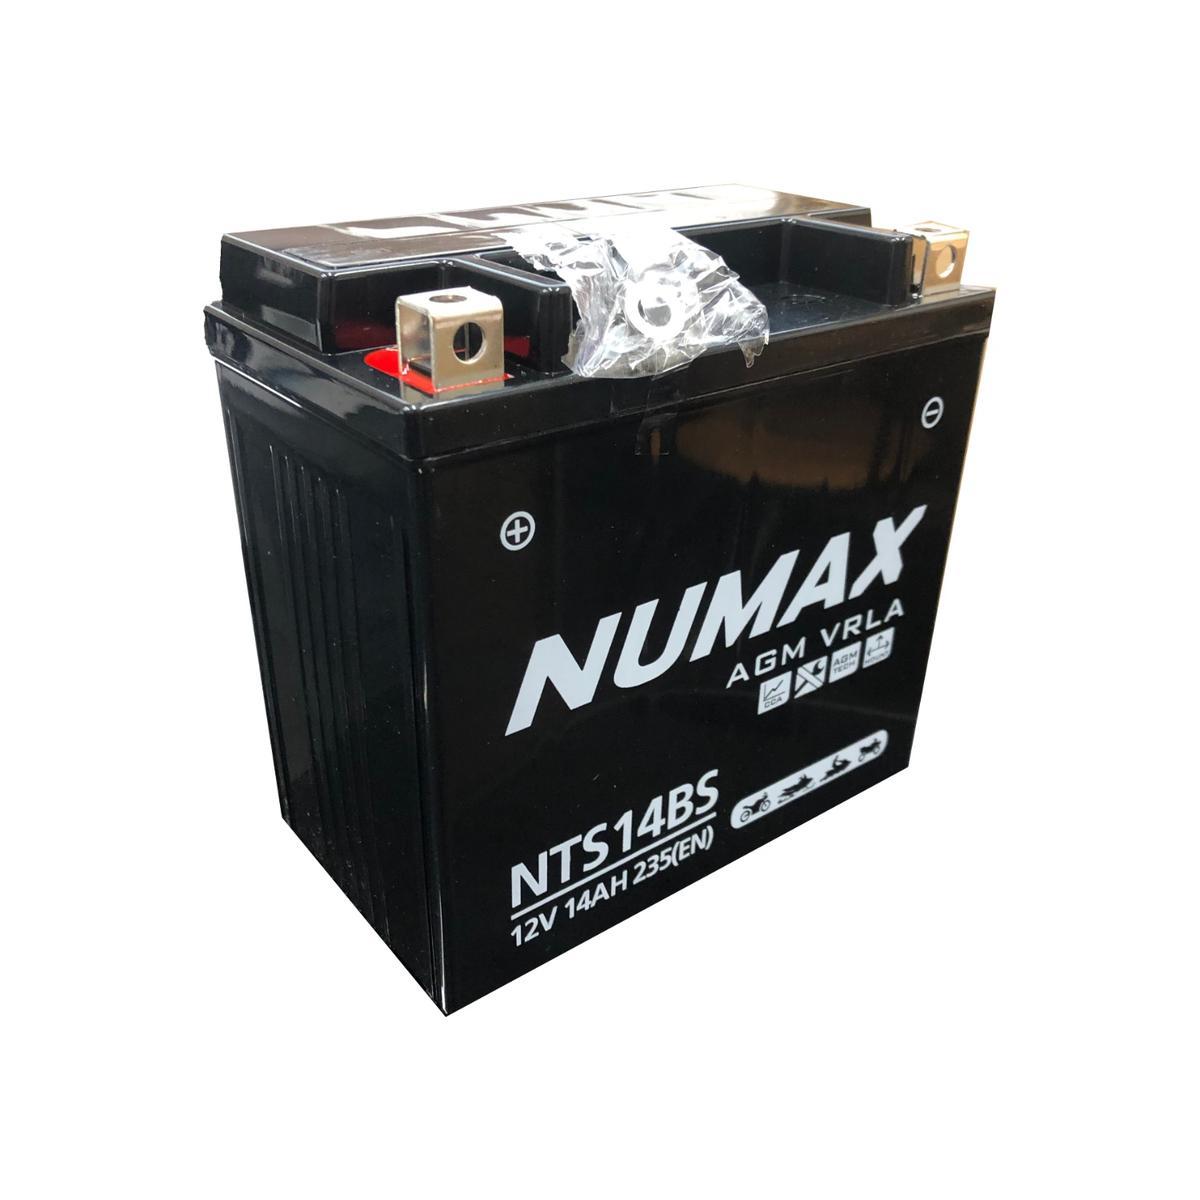 Numax NTS14BS 12v Motorbike Bike Battery HONDA 1100cc ABS-TCS YTX14-4